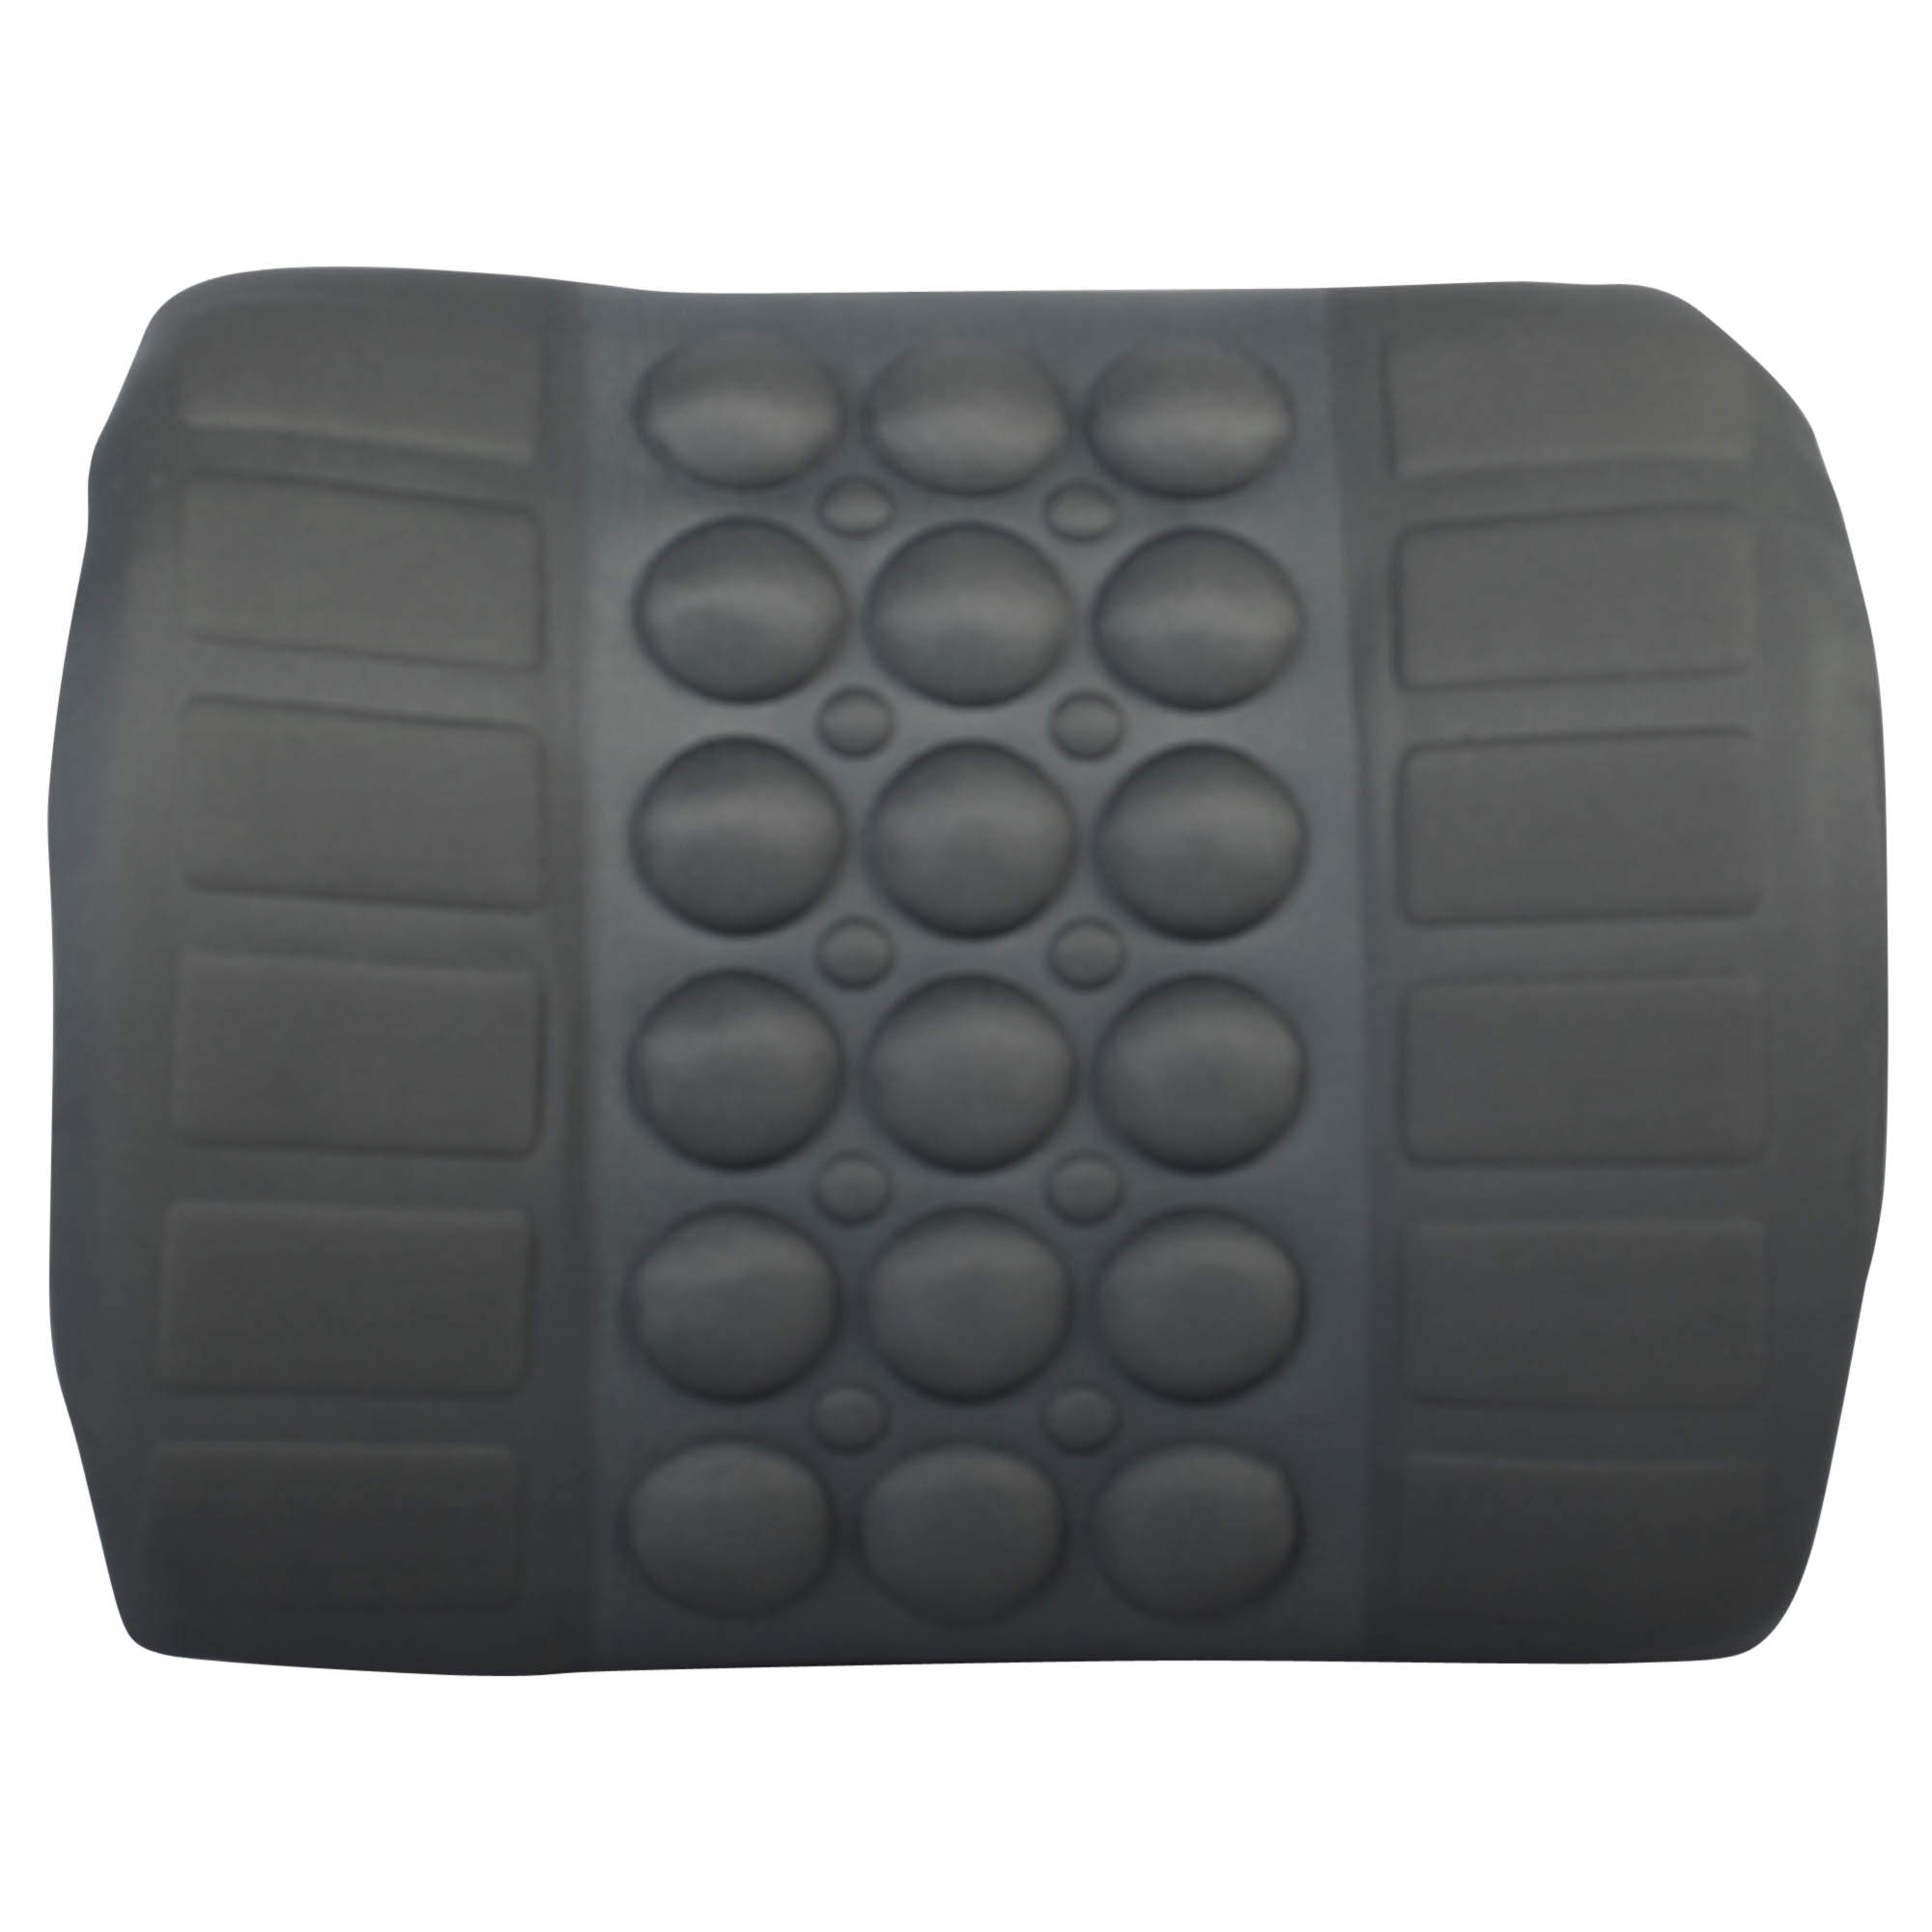 Lumbar Back Support Seat Cushion Ergonomic Car fice Home Seat